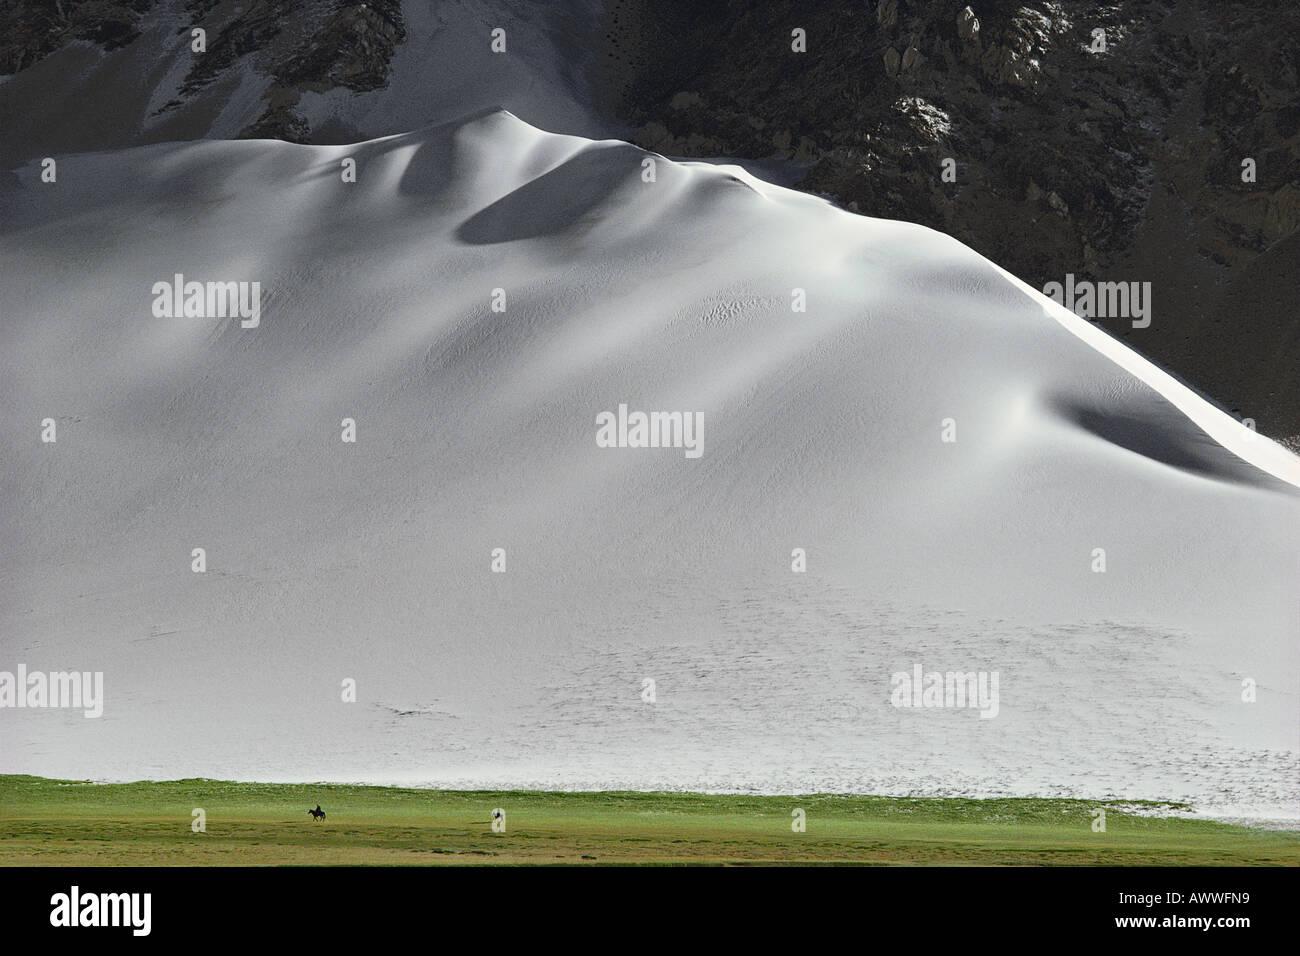 Horsemen beneath giant sand dune Pamir Range China 1980 - Stock Image